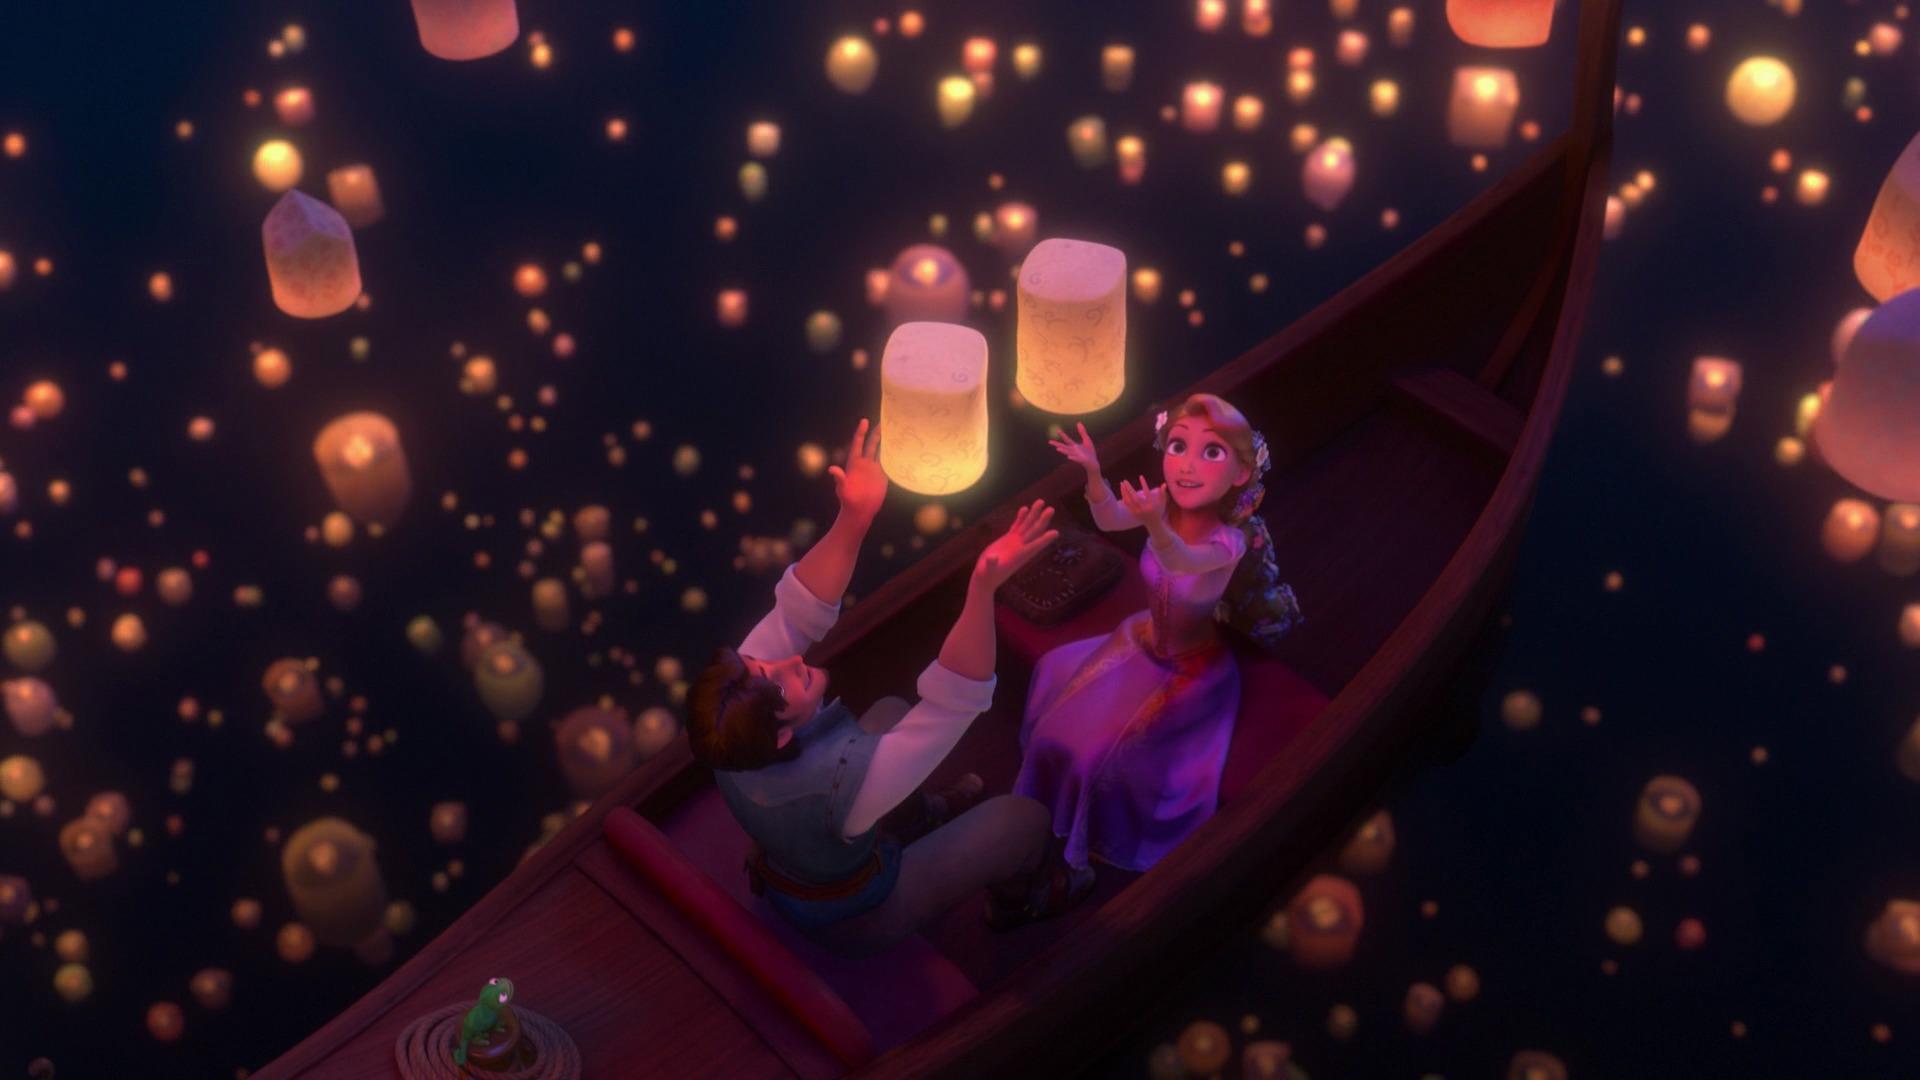 Image - Tangled-disneyscreencaps com-8071.jpg | Disney Wiki ... for Lantern Festival Tangled  66pct